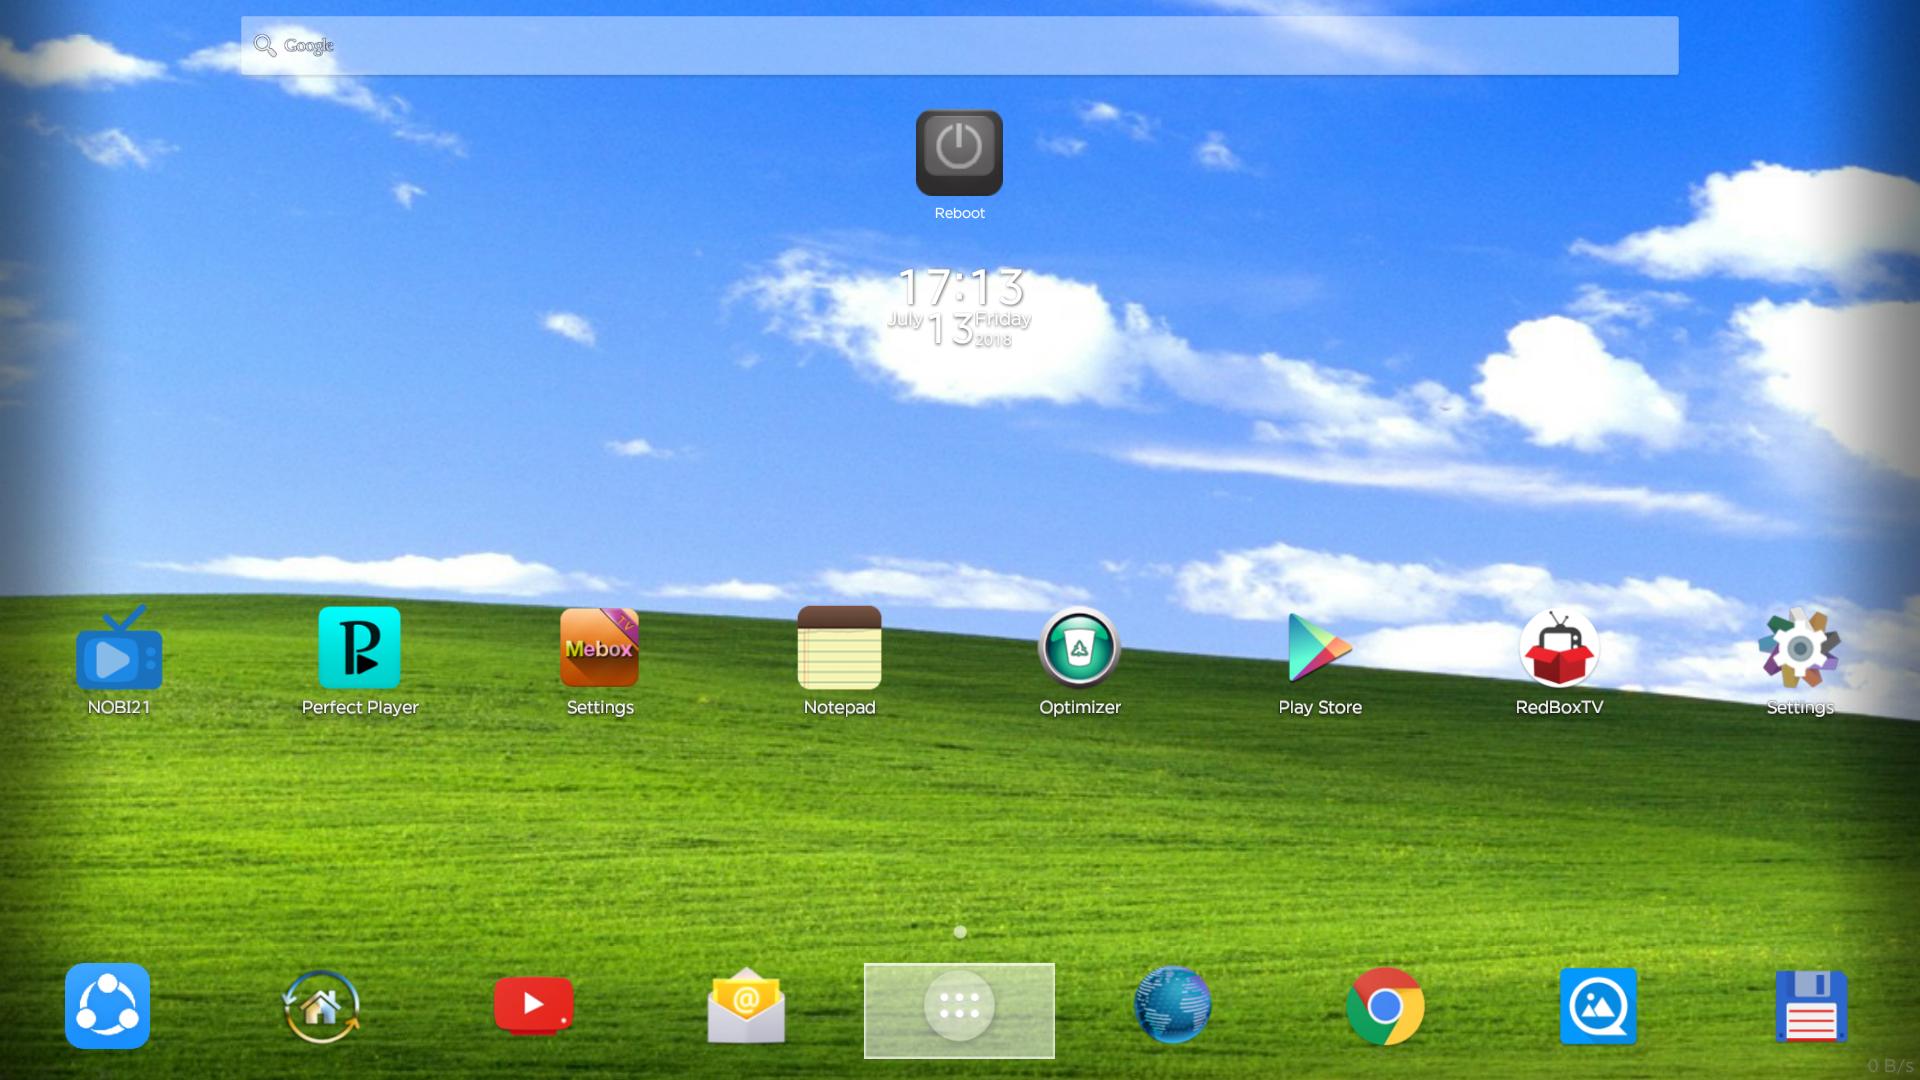 Jual Stb Android Tv Root Zte Hybrid Zxv10 B760h Set Top Box Indihome Networkingtools Shop Tokopedia